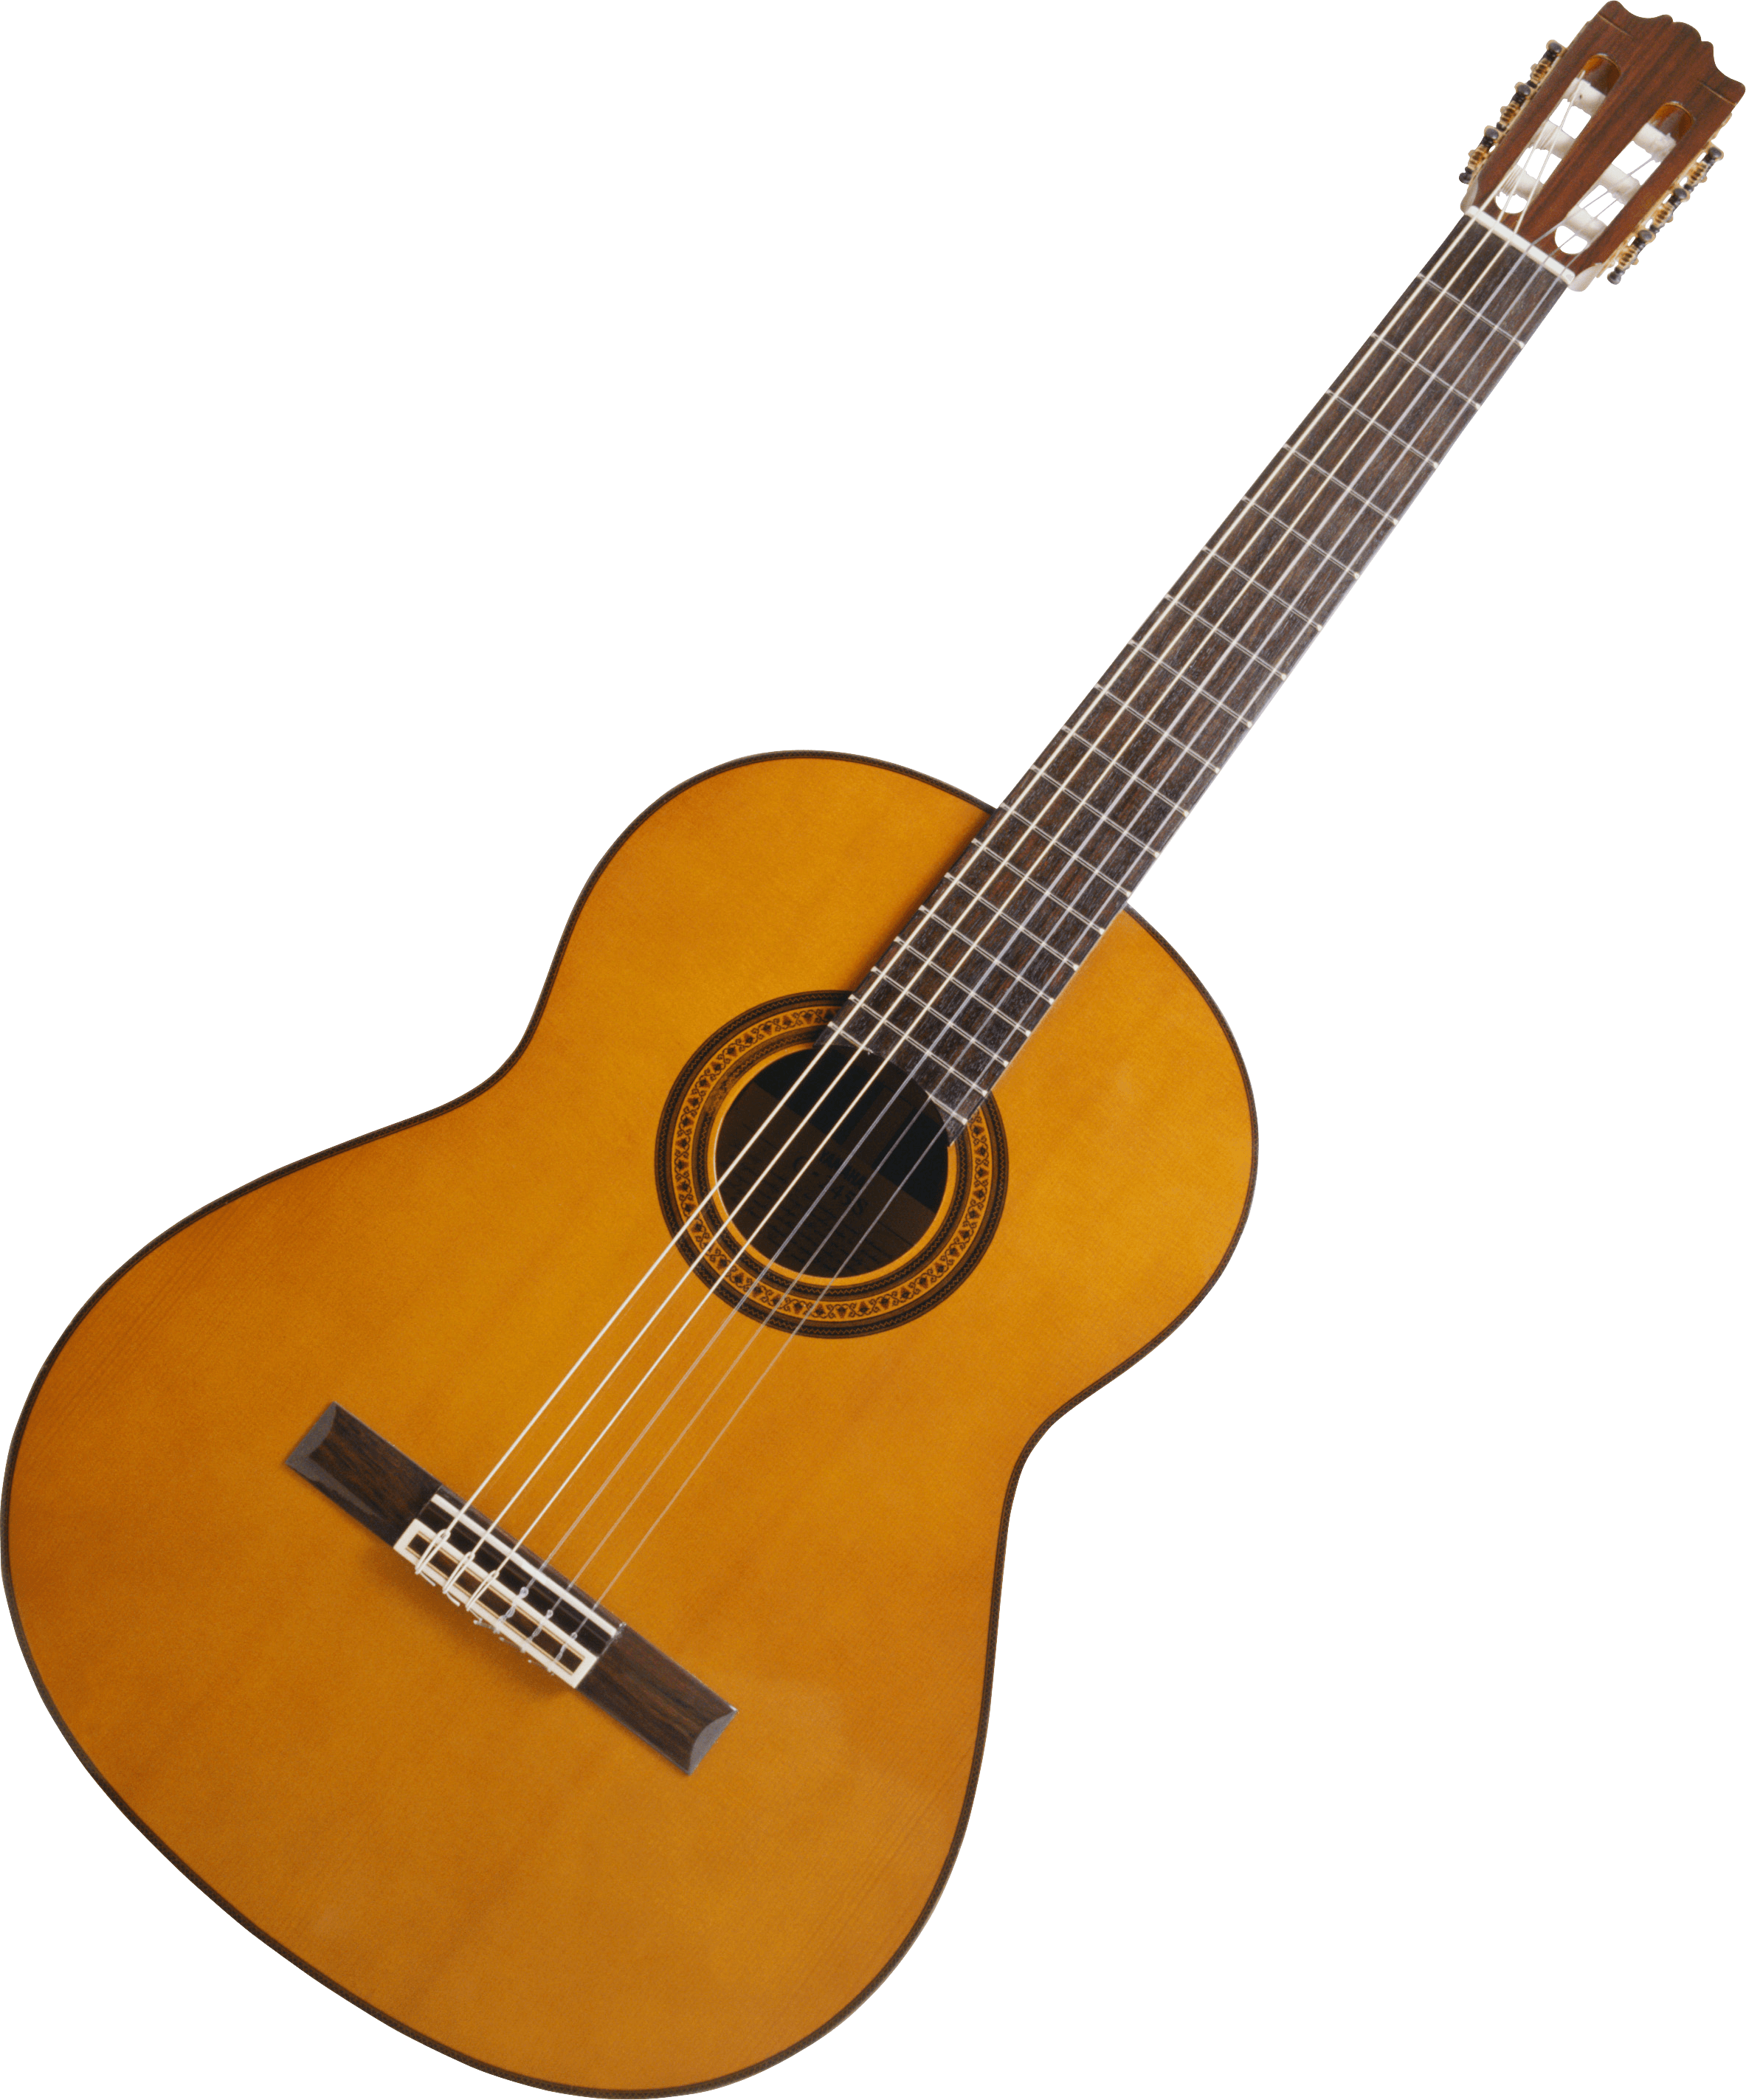 Acoustic HD PNG - 89257